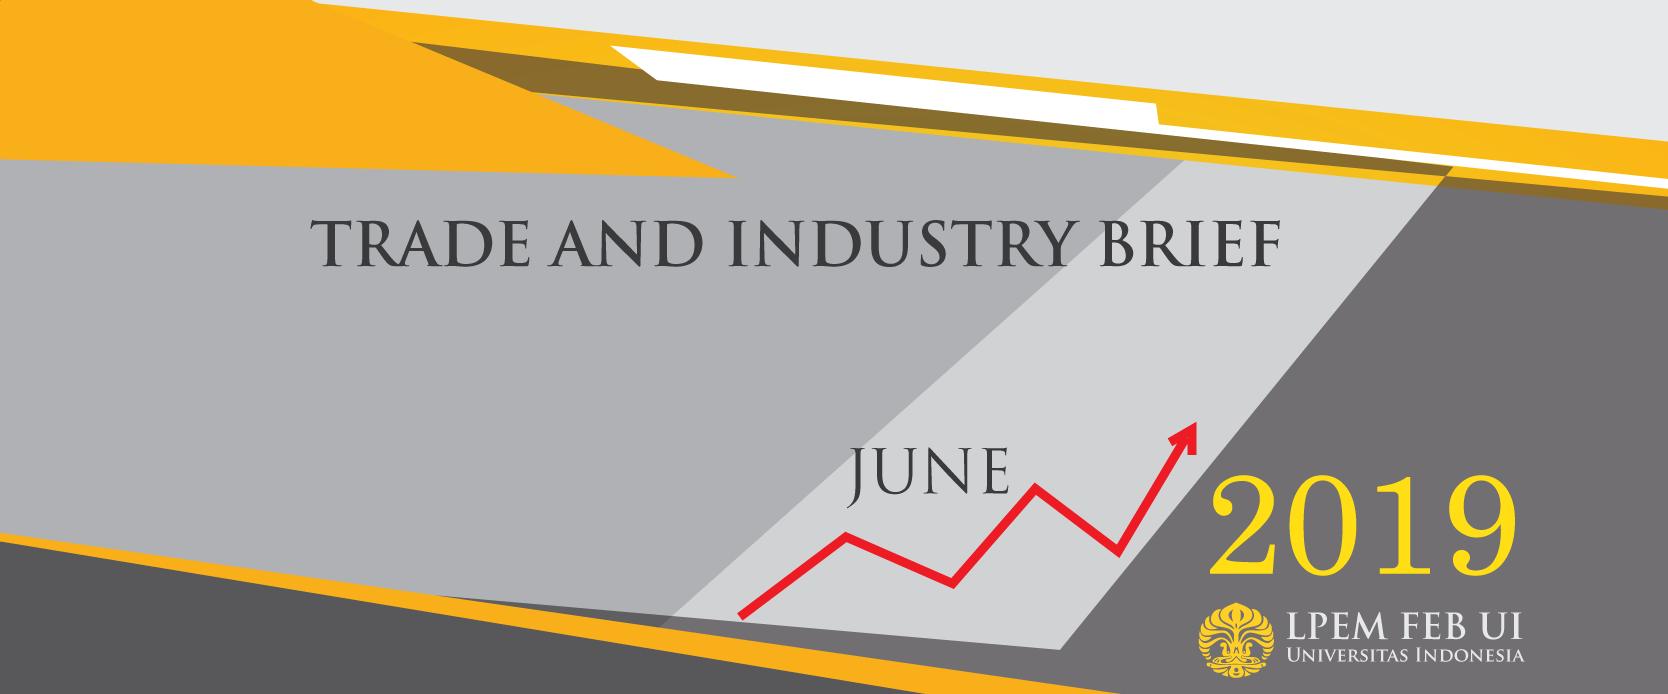 SERI ANALISIS EKONOMI: TRADE AND INDUSTRY BRIEF, Juni 2019